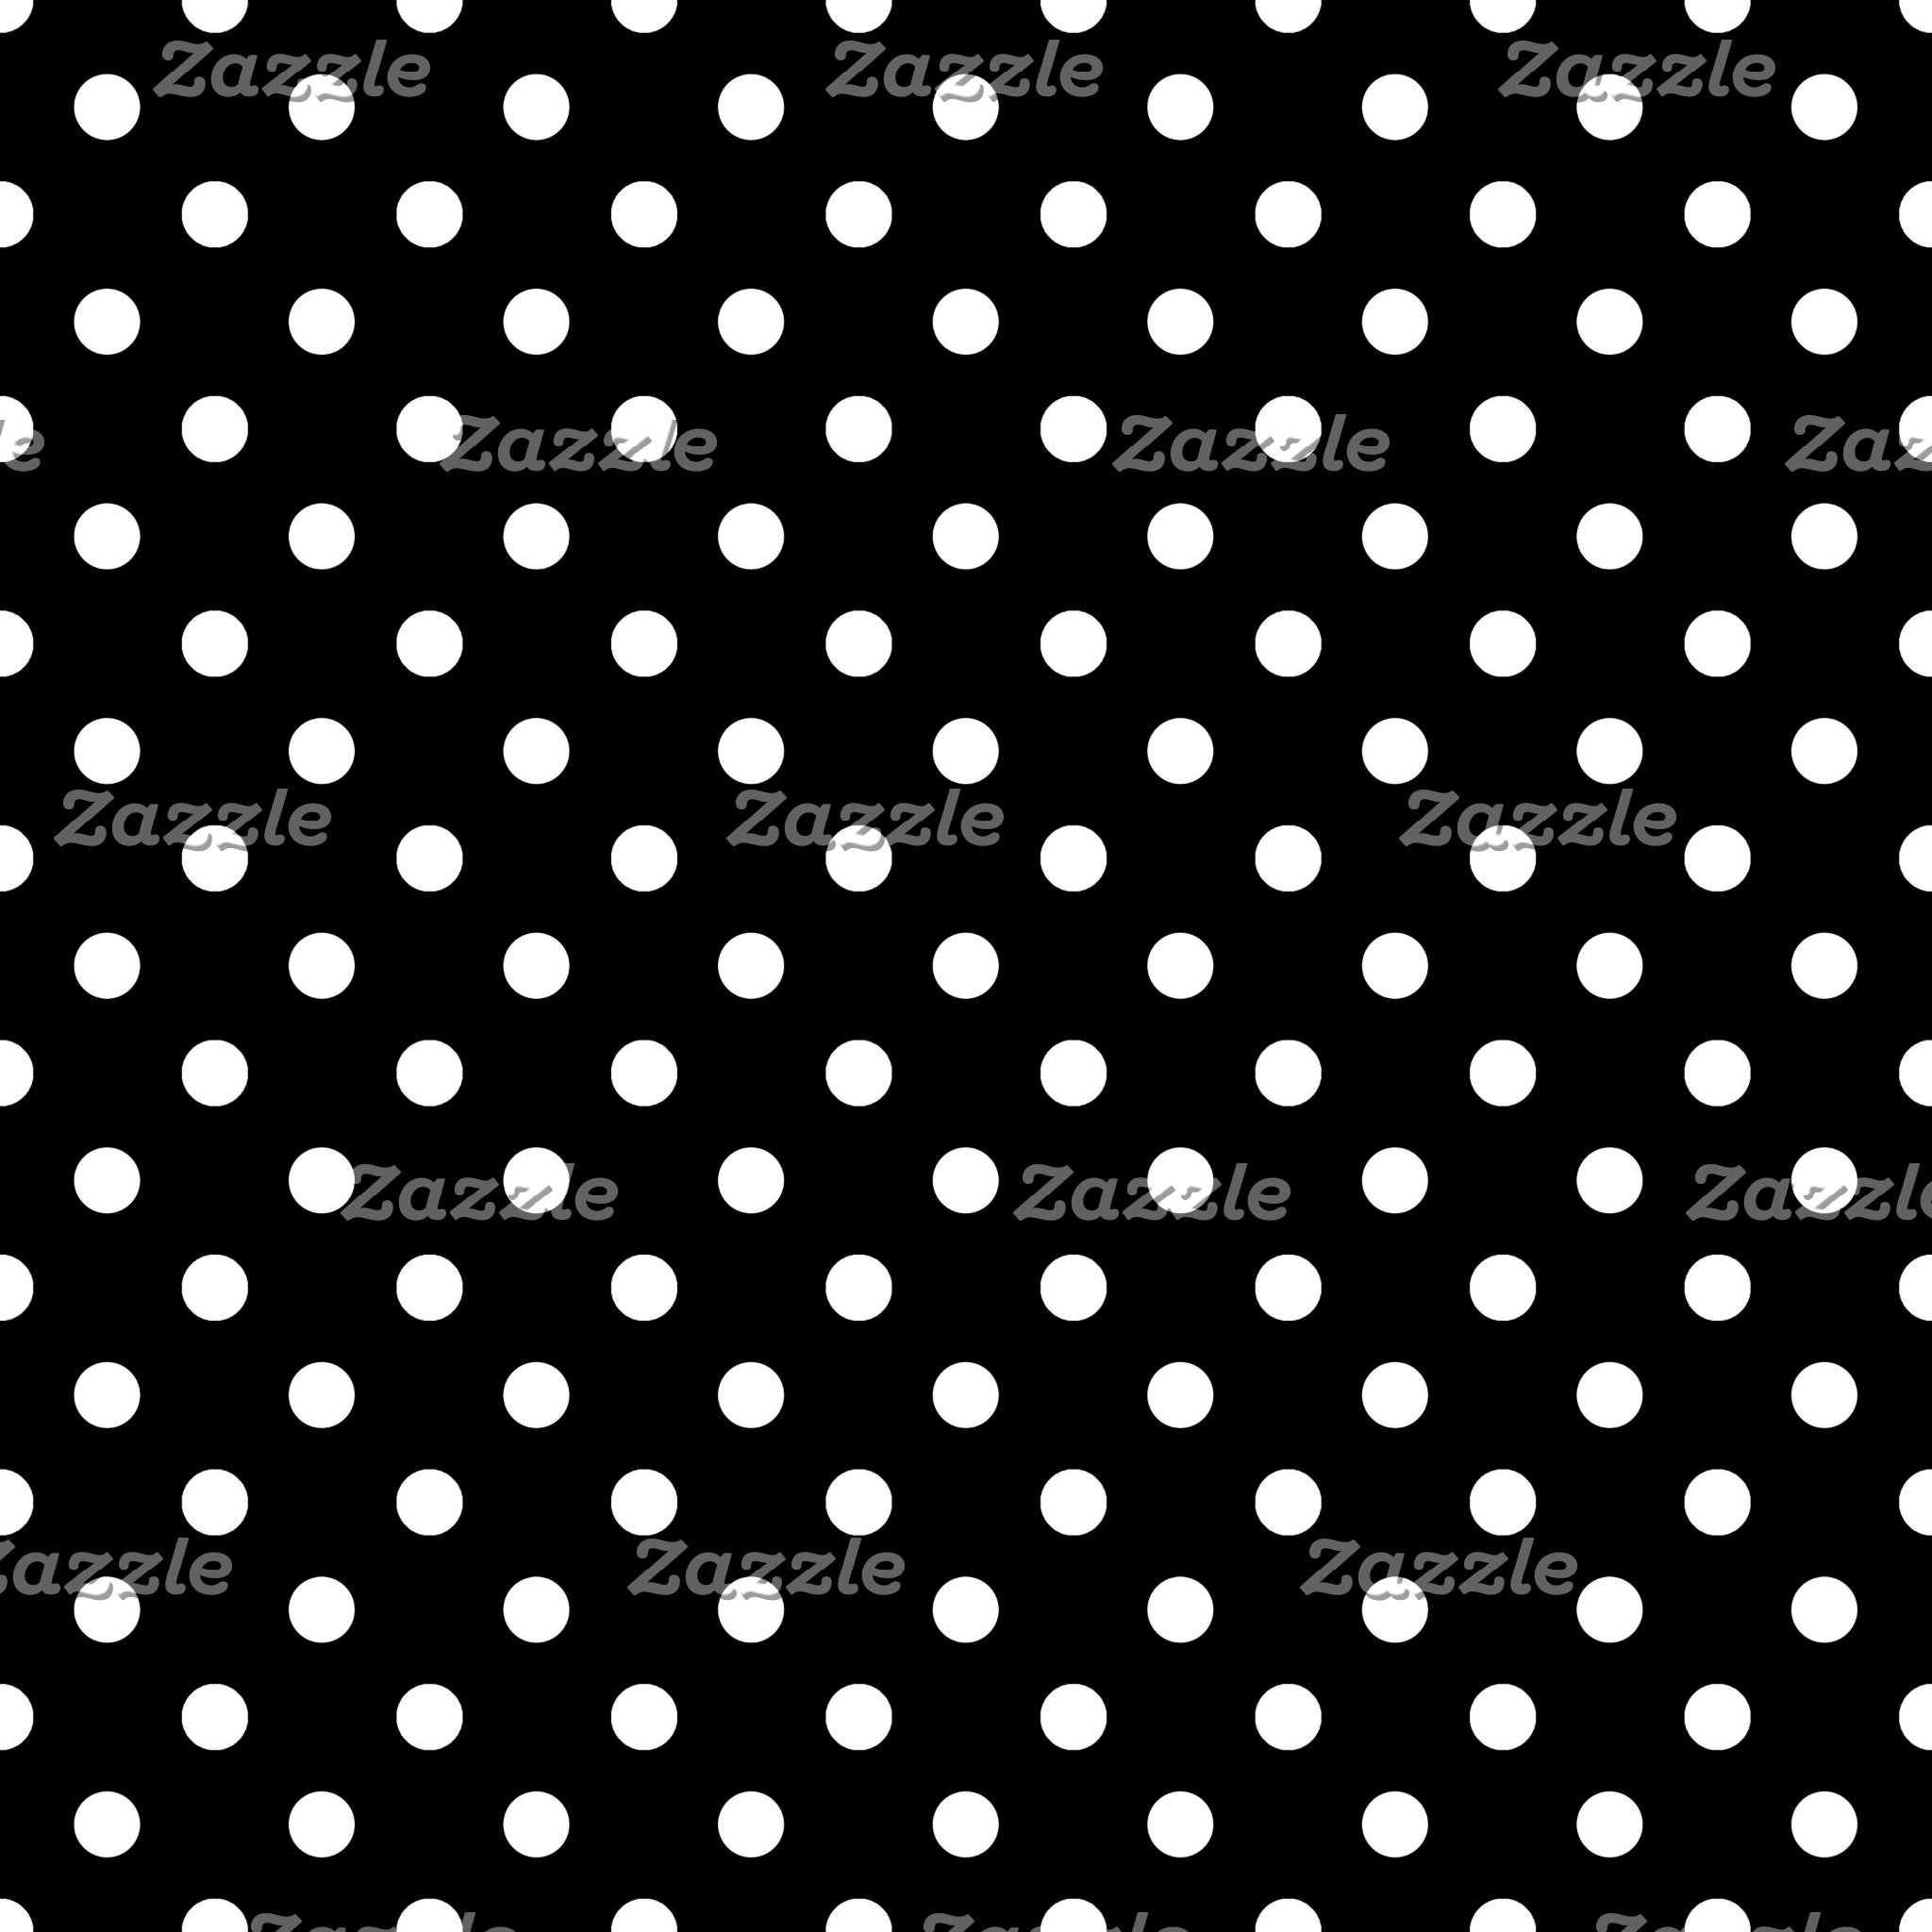 Black & White Polka Dot Bathroom and Home Decor